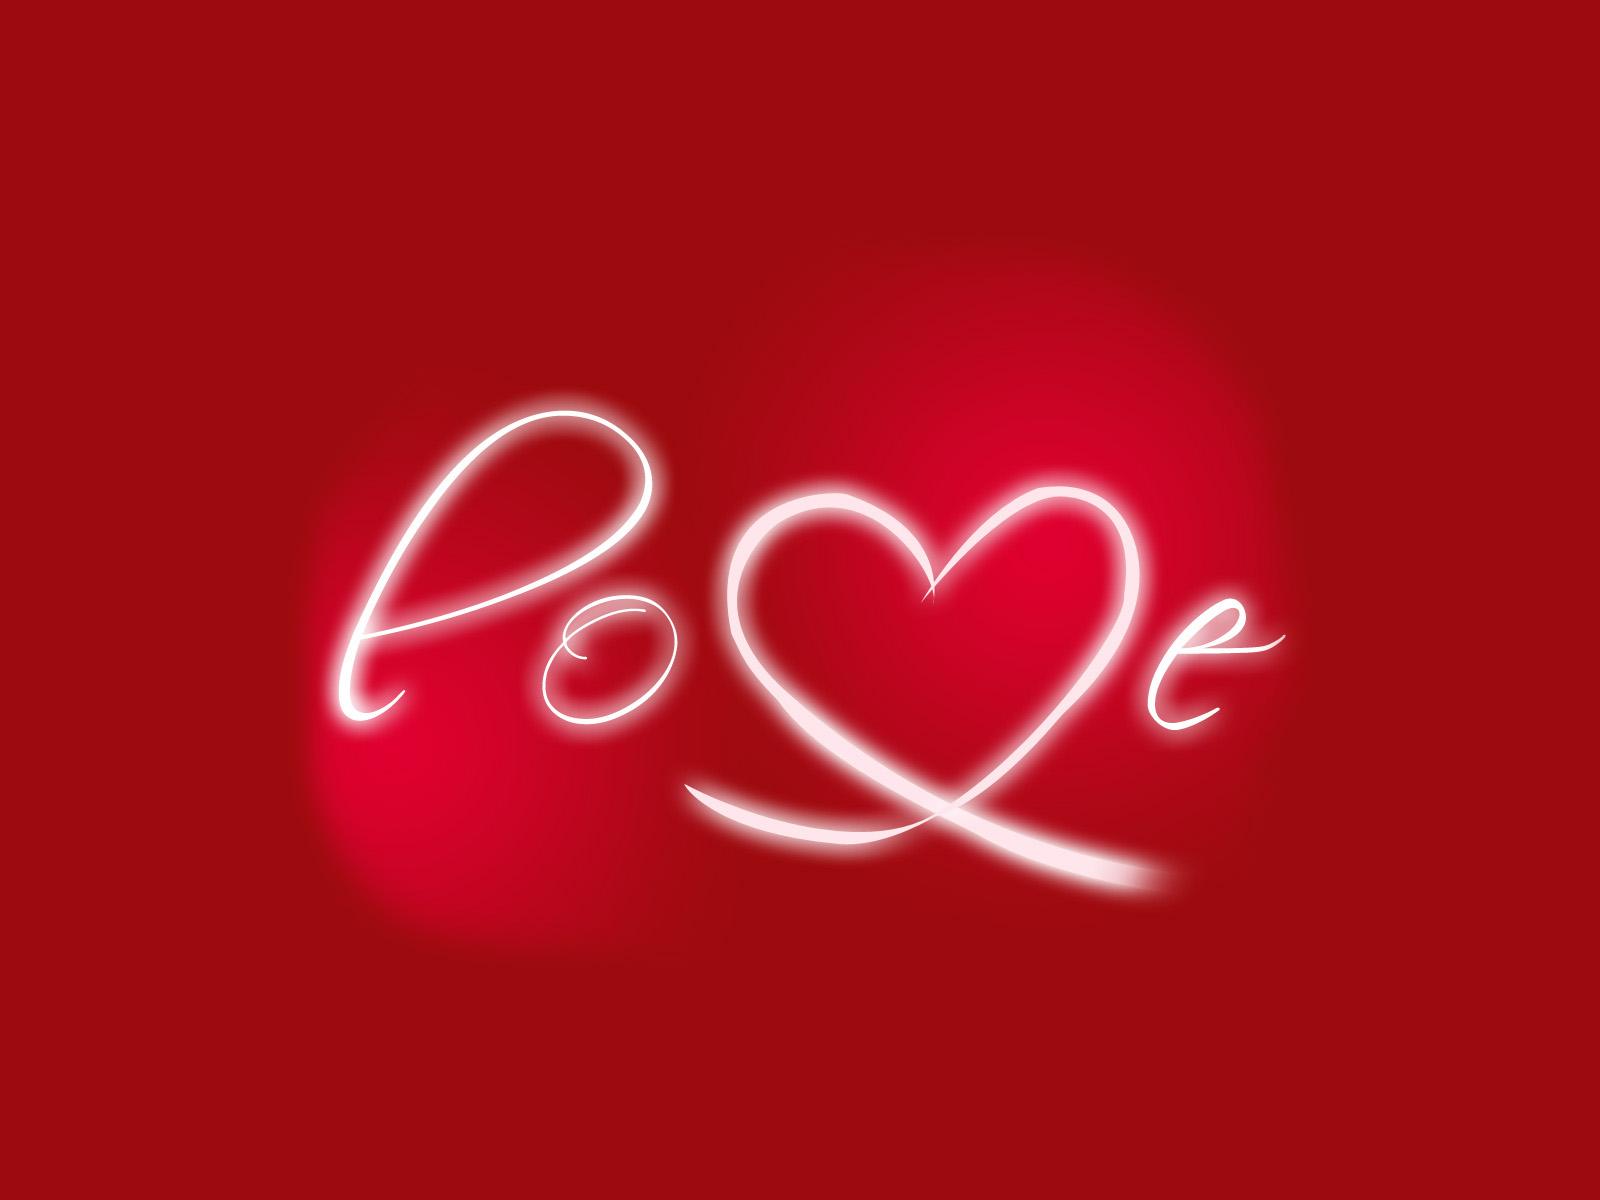 http://3.bp.blogspot.com/-JZqDpQypaLs/UEyM5bmMGFI/AAAAAAAAC4s/A3vBdKudUEM/s1600/Love.jpg